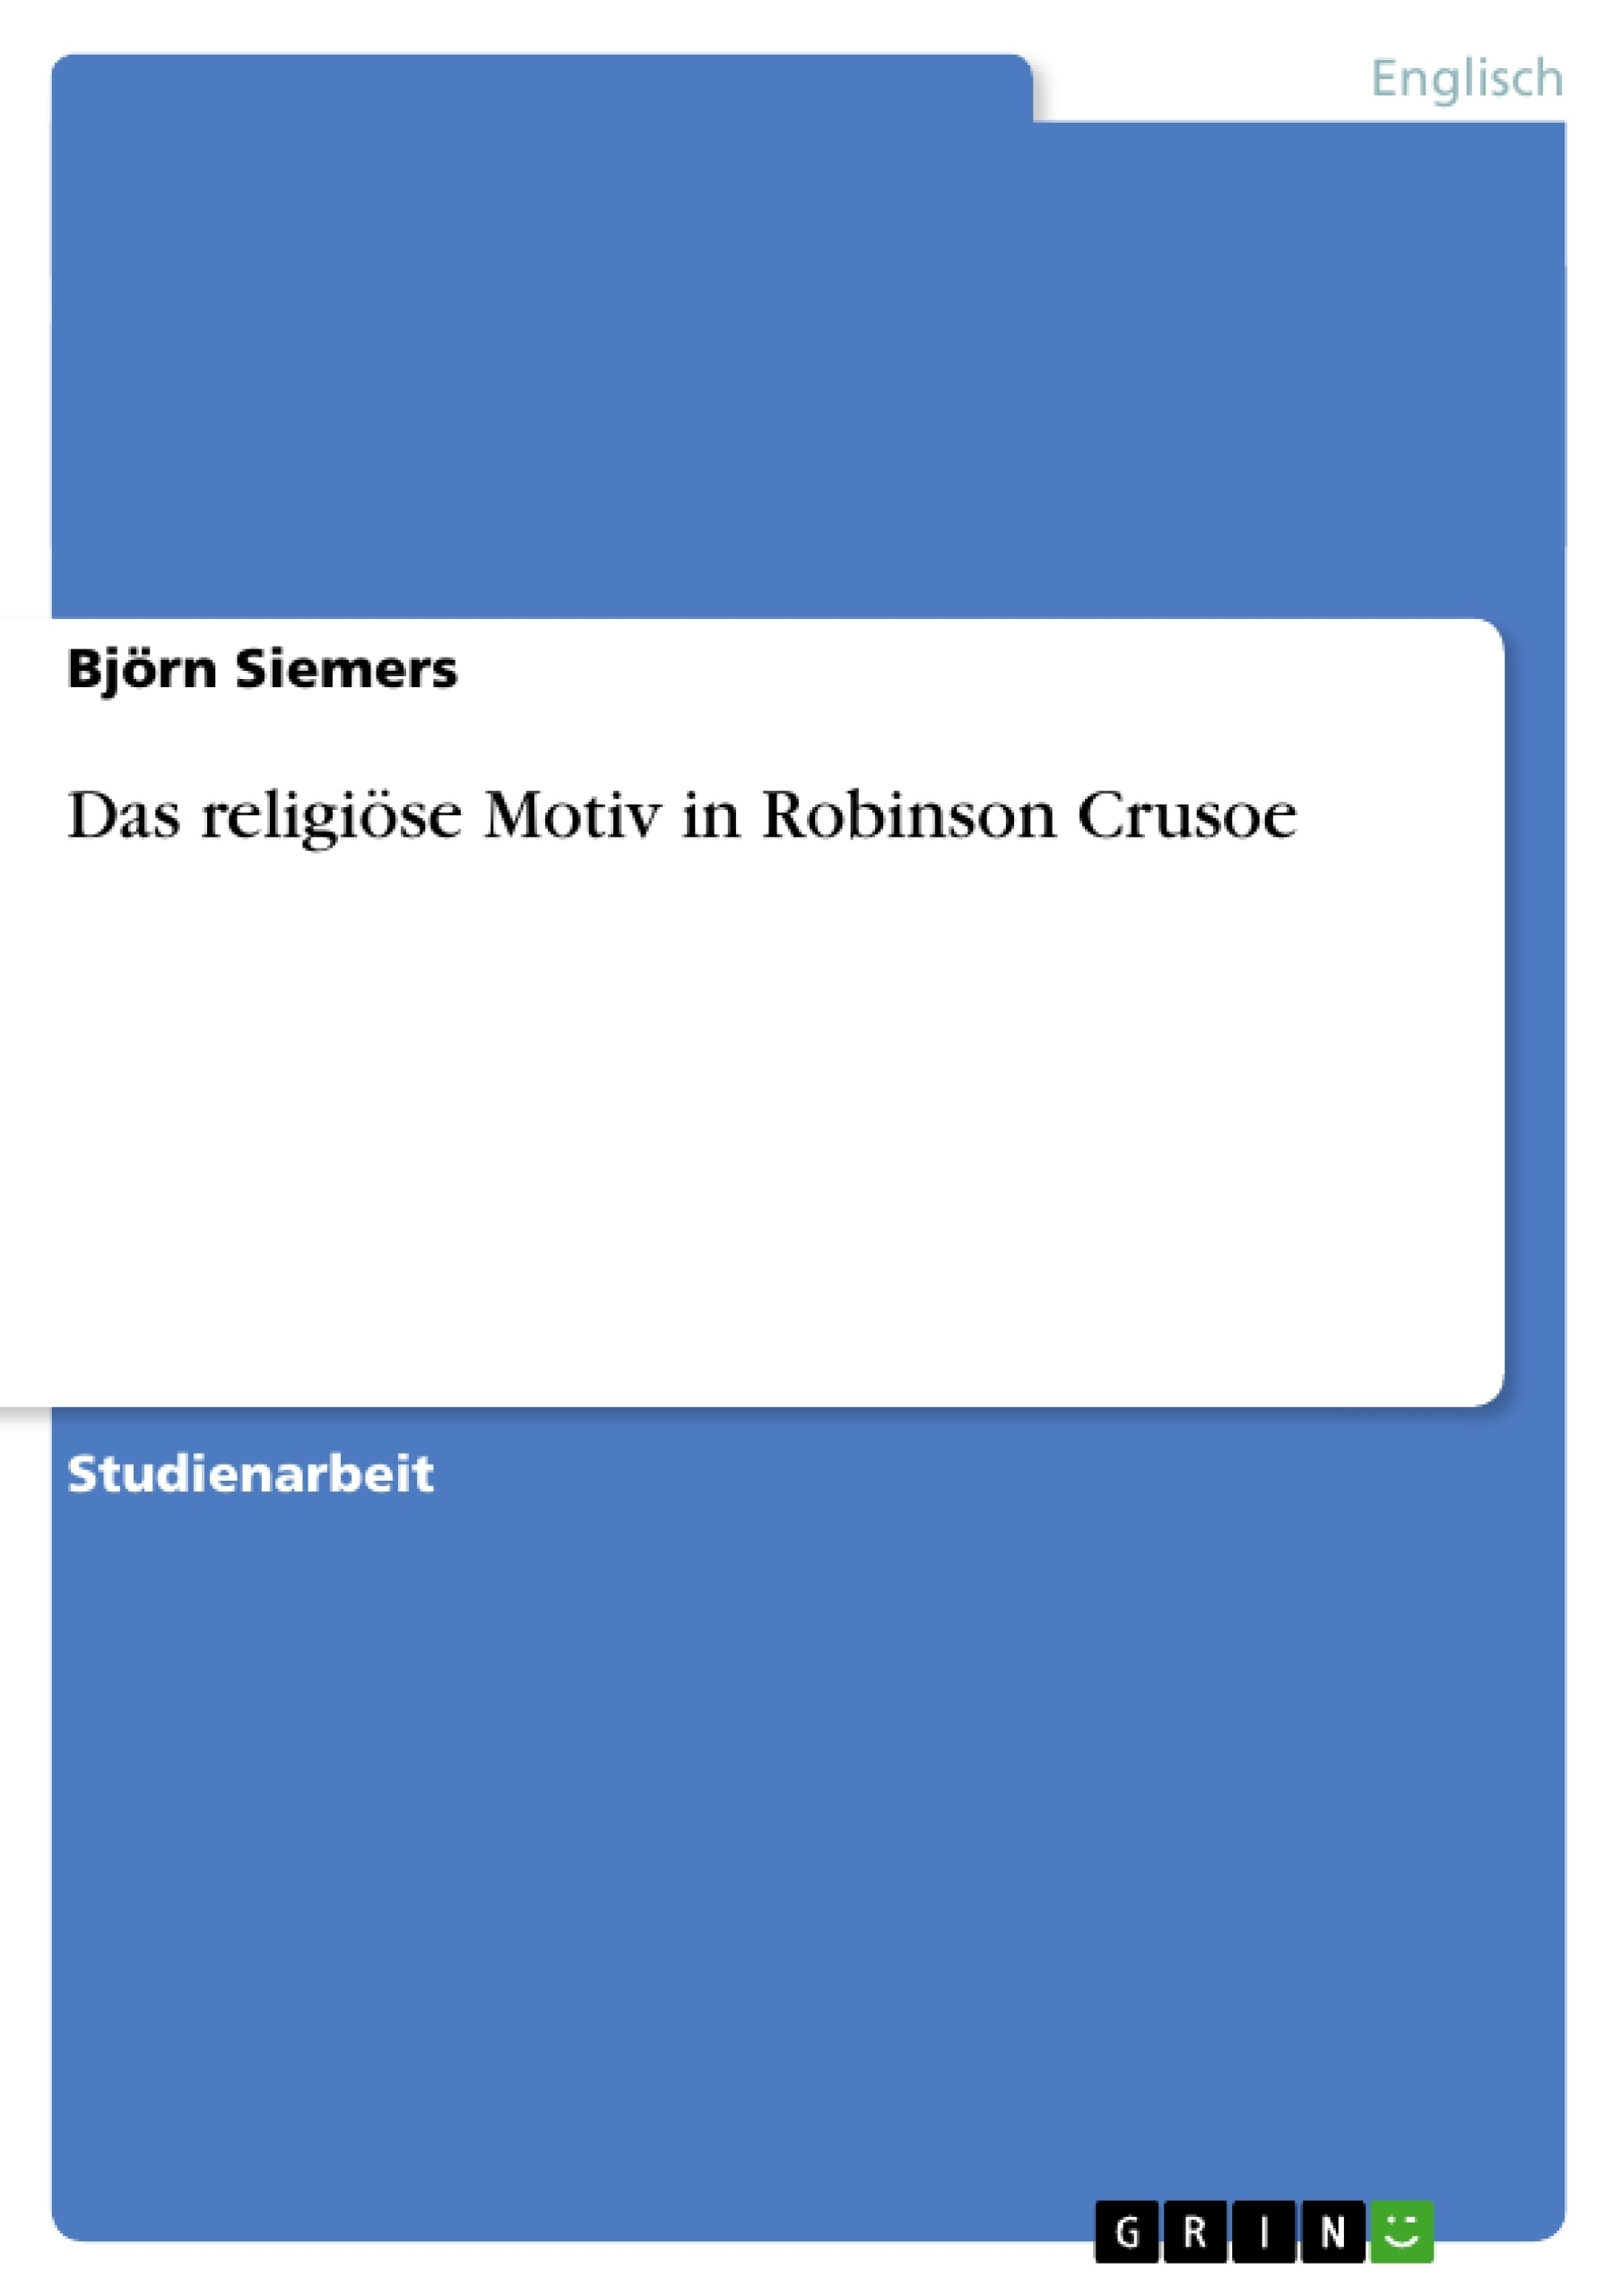 Titel: Das religiöse Motiv in Robinson Crusoe